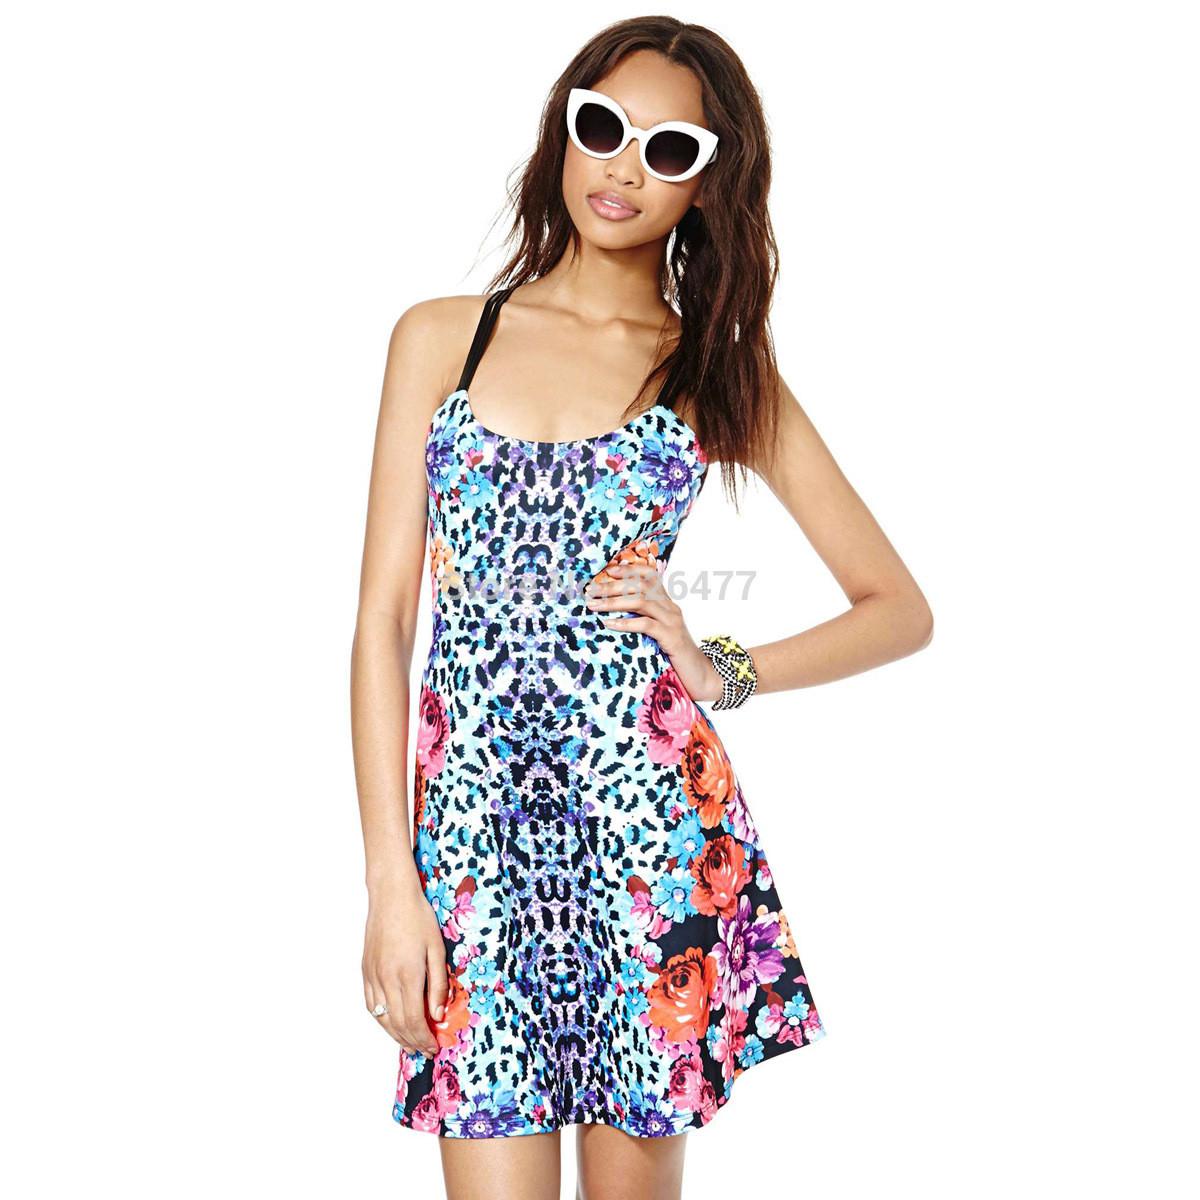 Spaghetti Strap Summer Dresses  Spaghetti Strap Summer Dresses